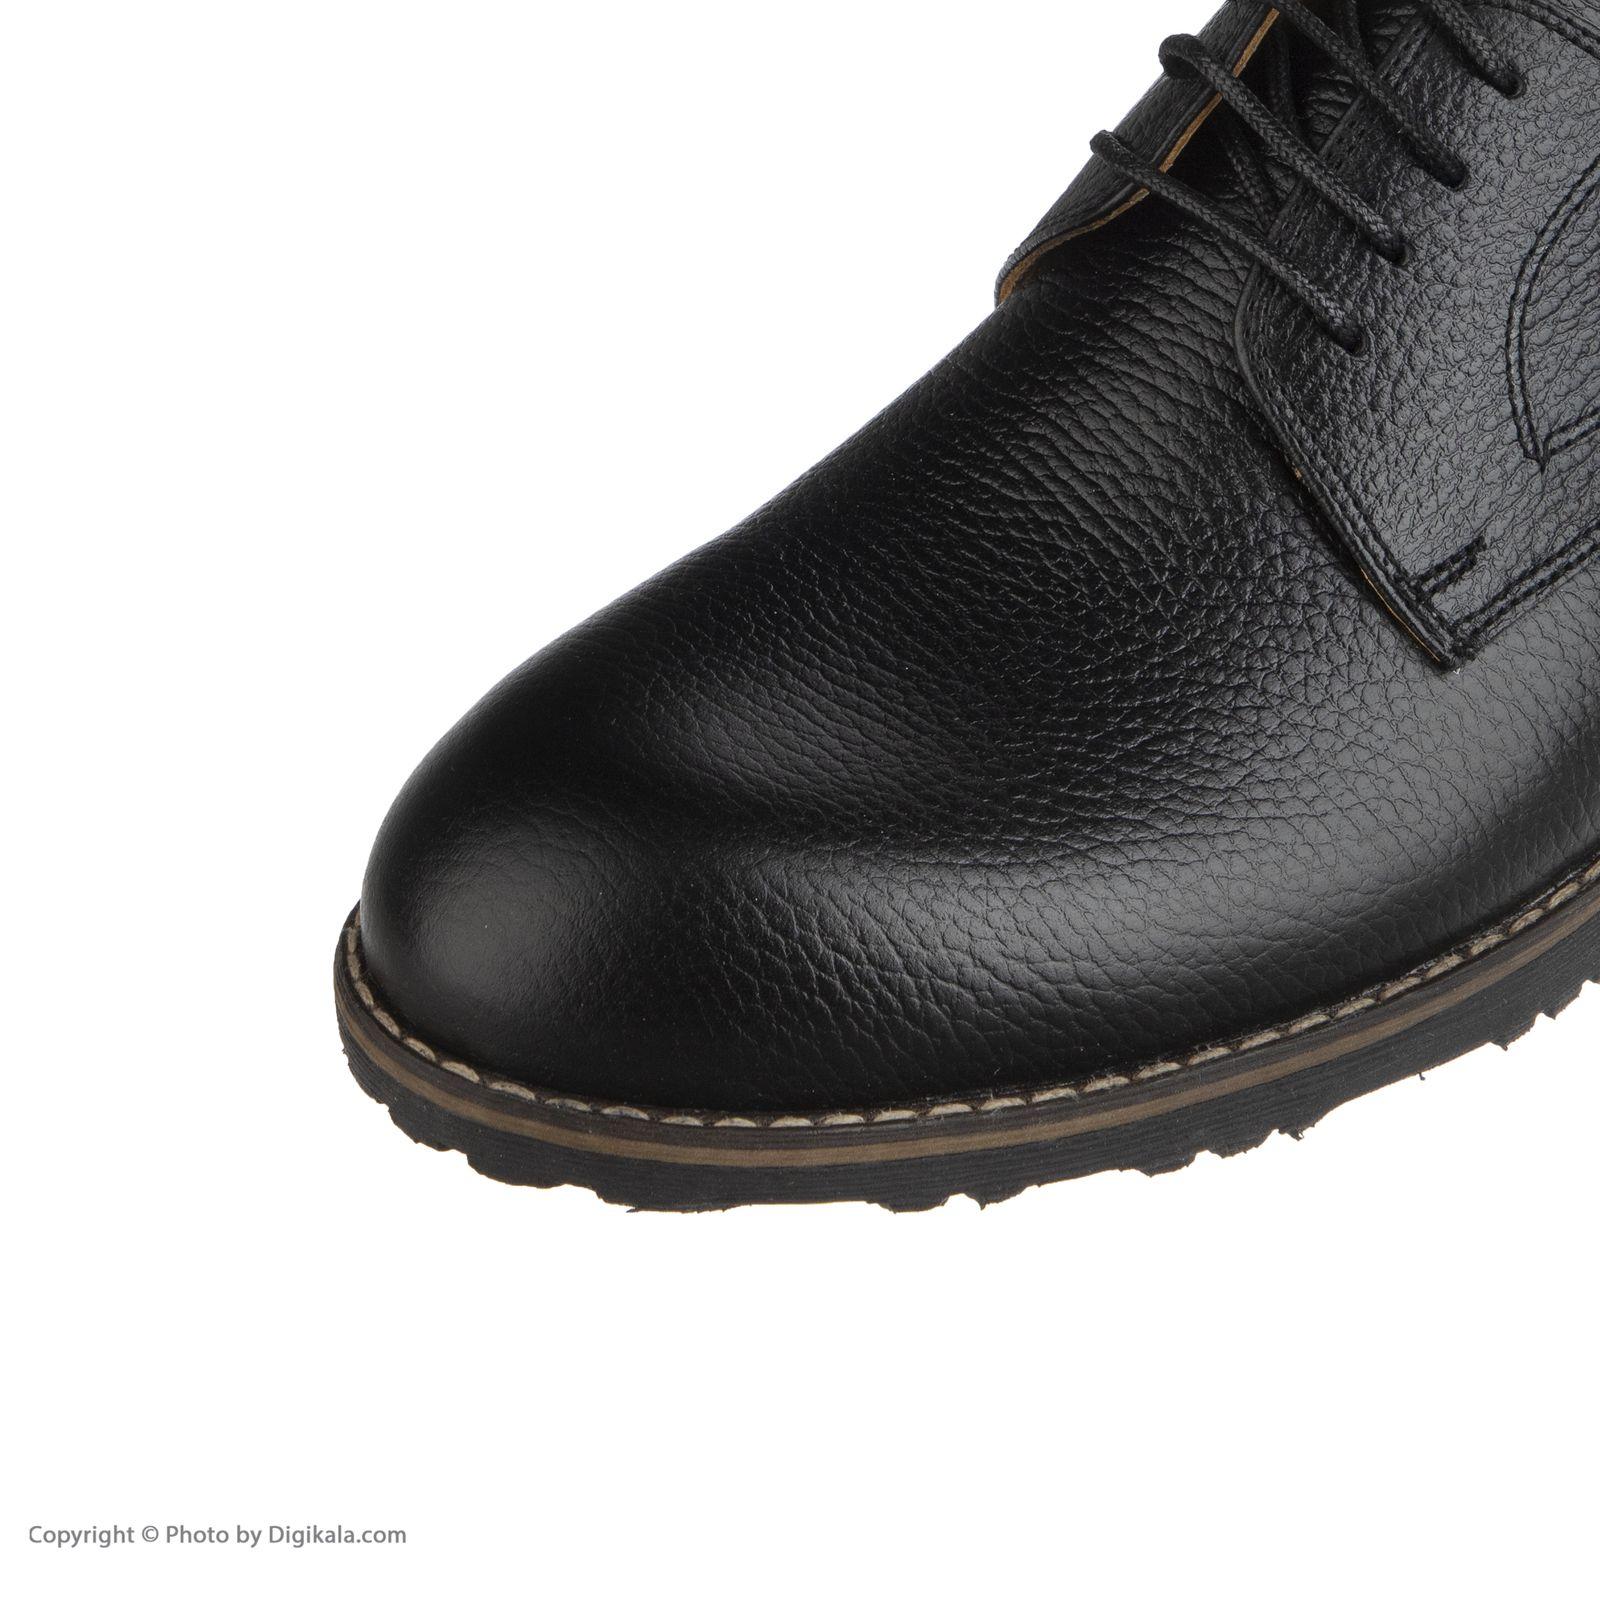 کفش روزمره مردانه شیفر مدل 7046N503101 -  - 8